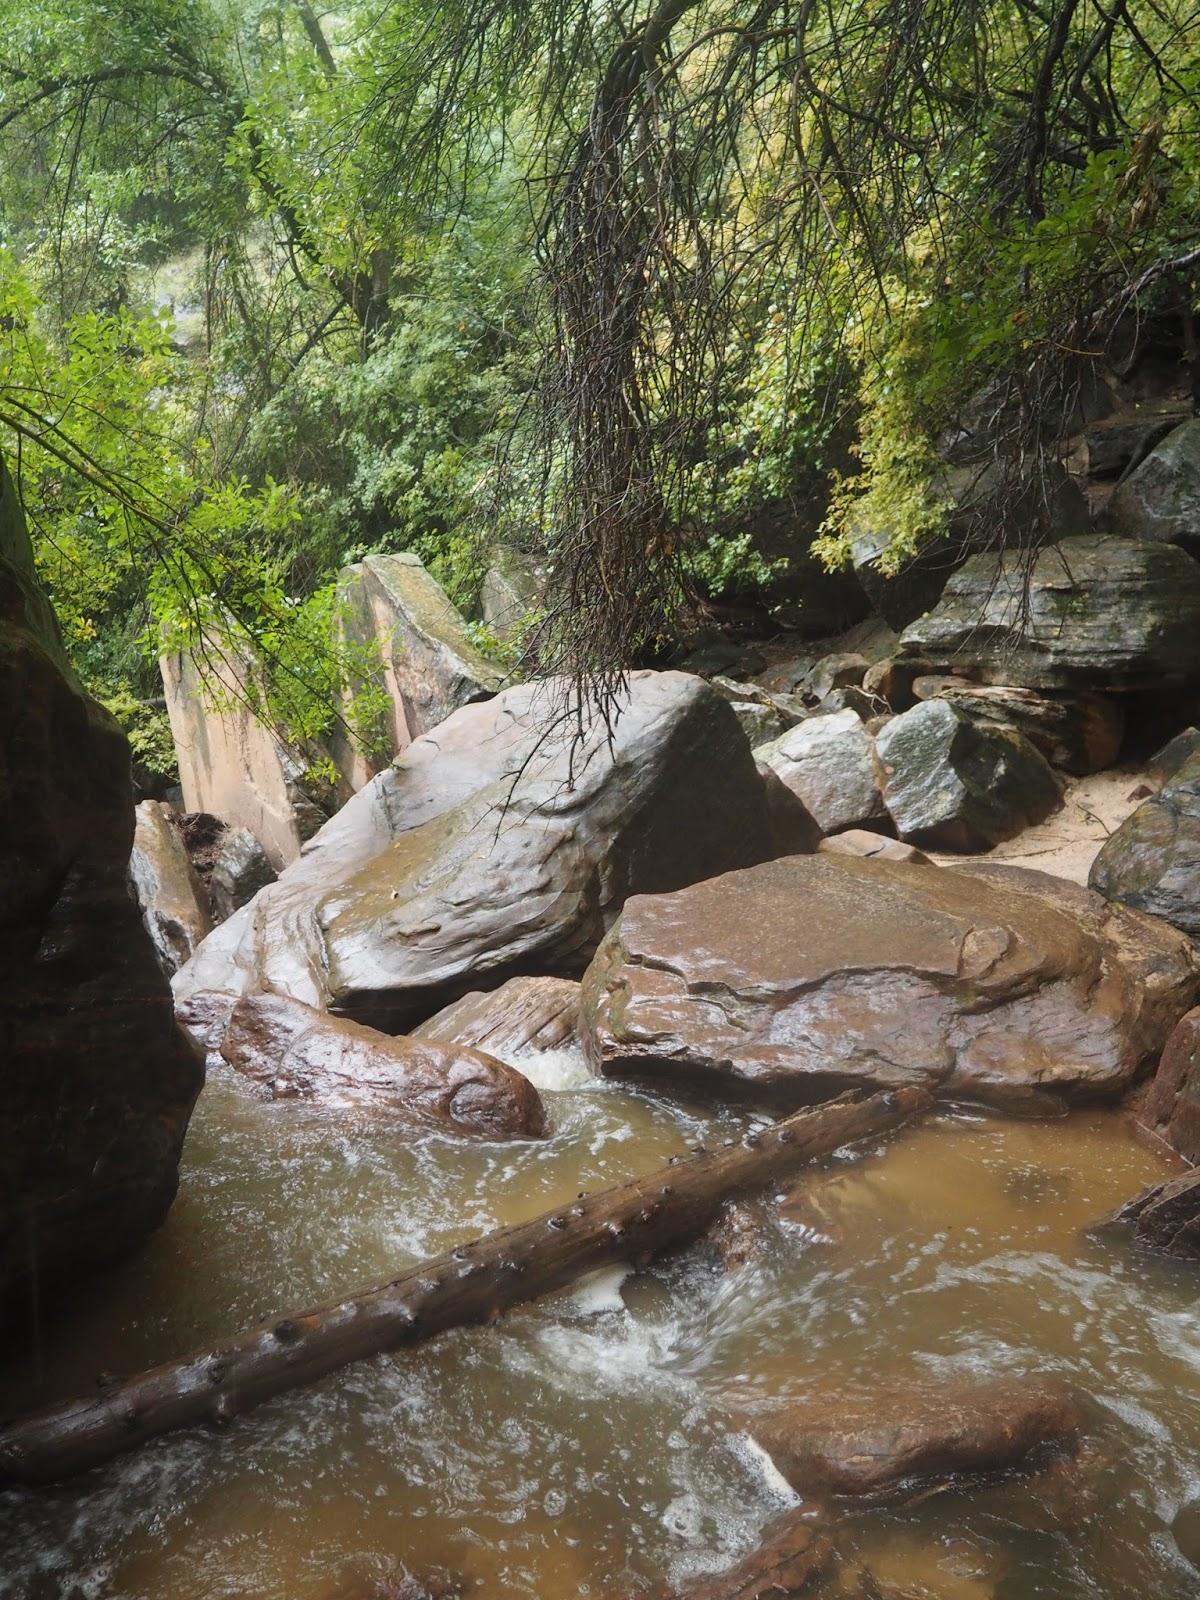 River in Zion National Park, Utah